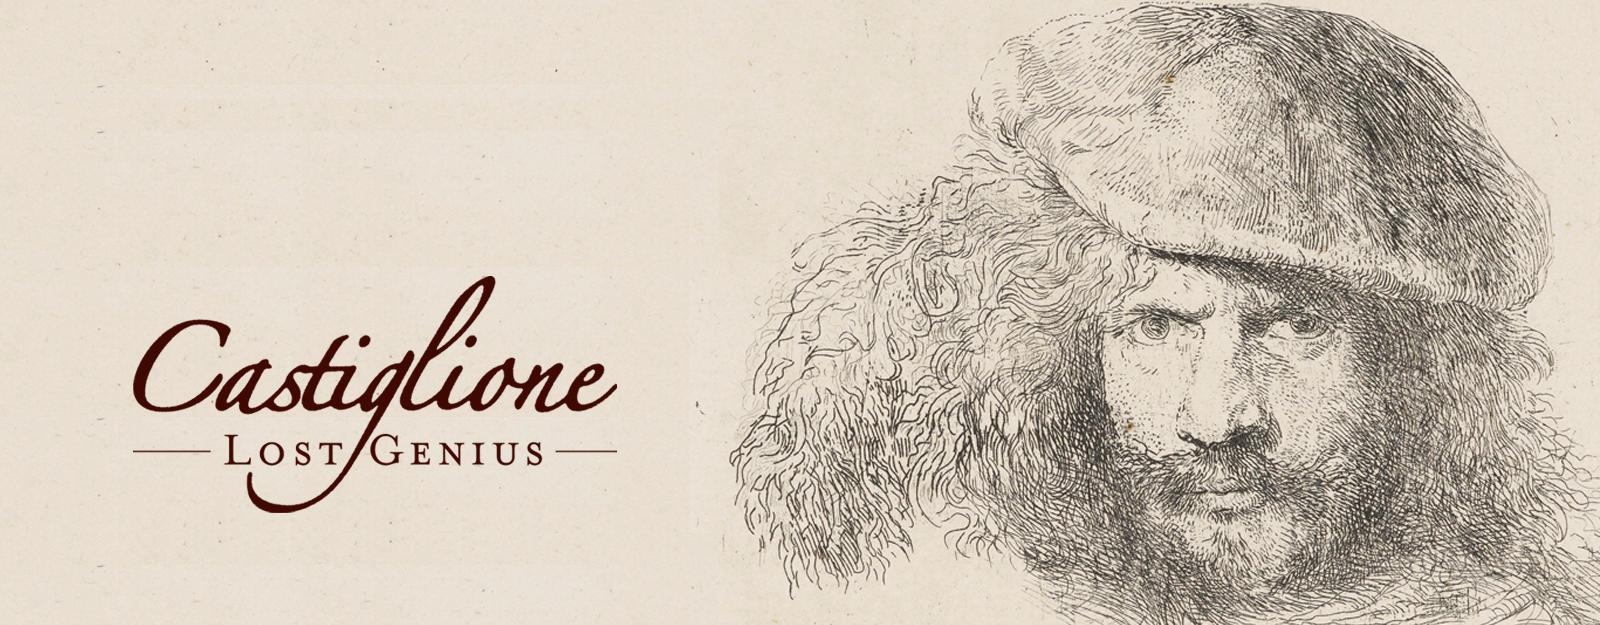 Explore the exhibition 'Castiglione: Lost Genius' at The Queen's Gallery, Edinburgh opening November 2014.